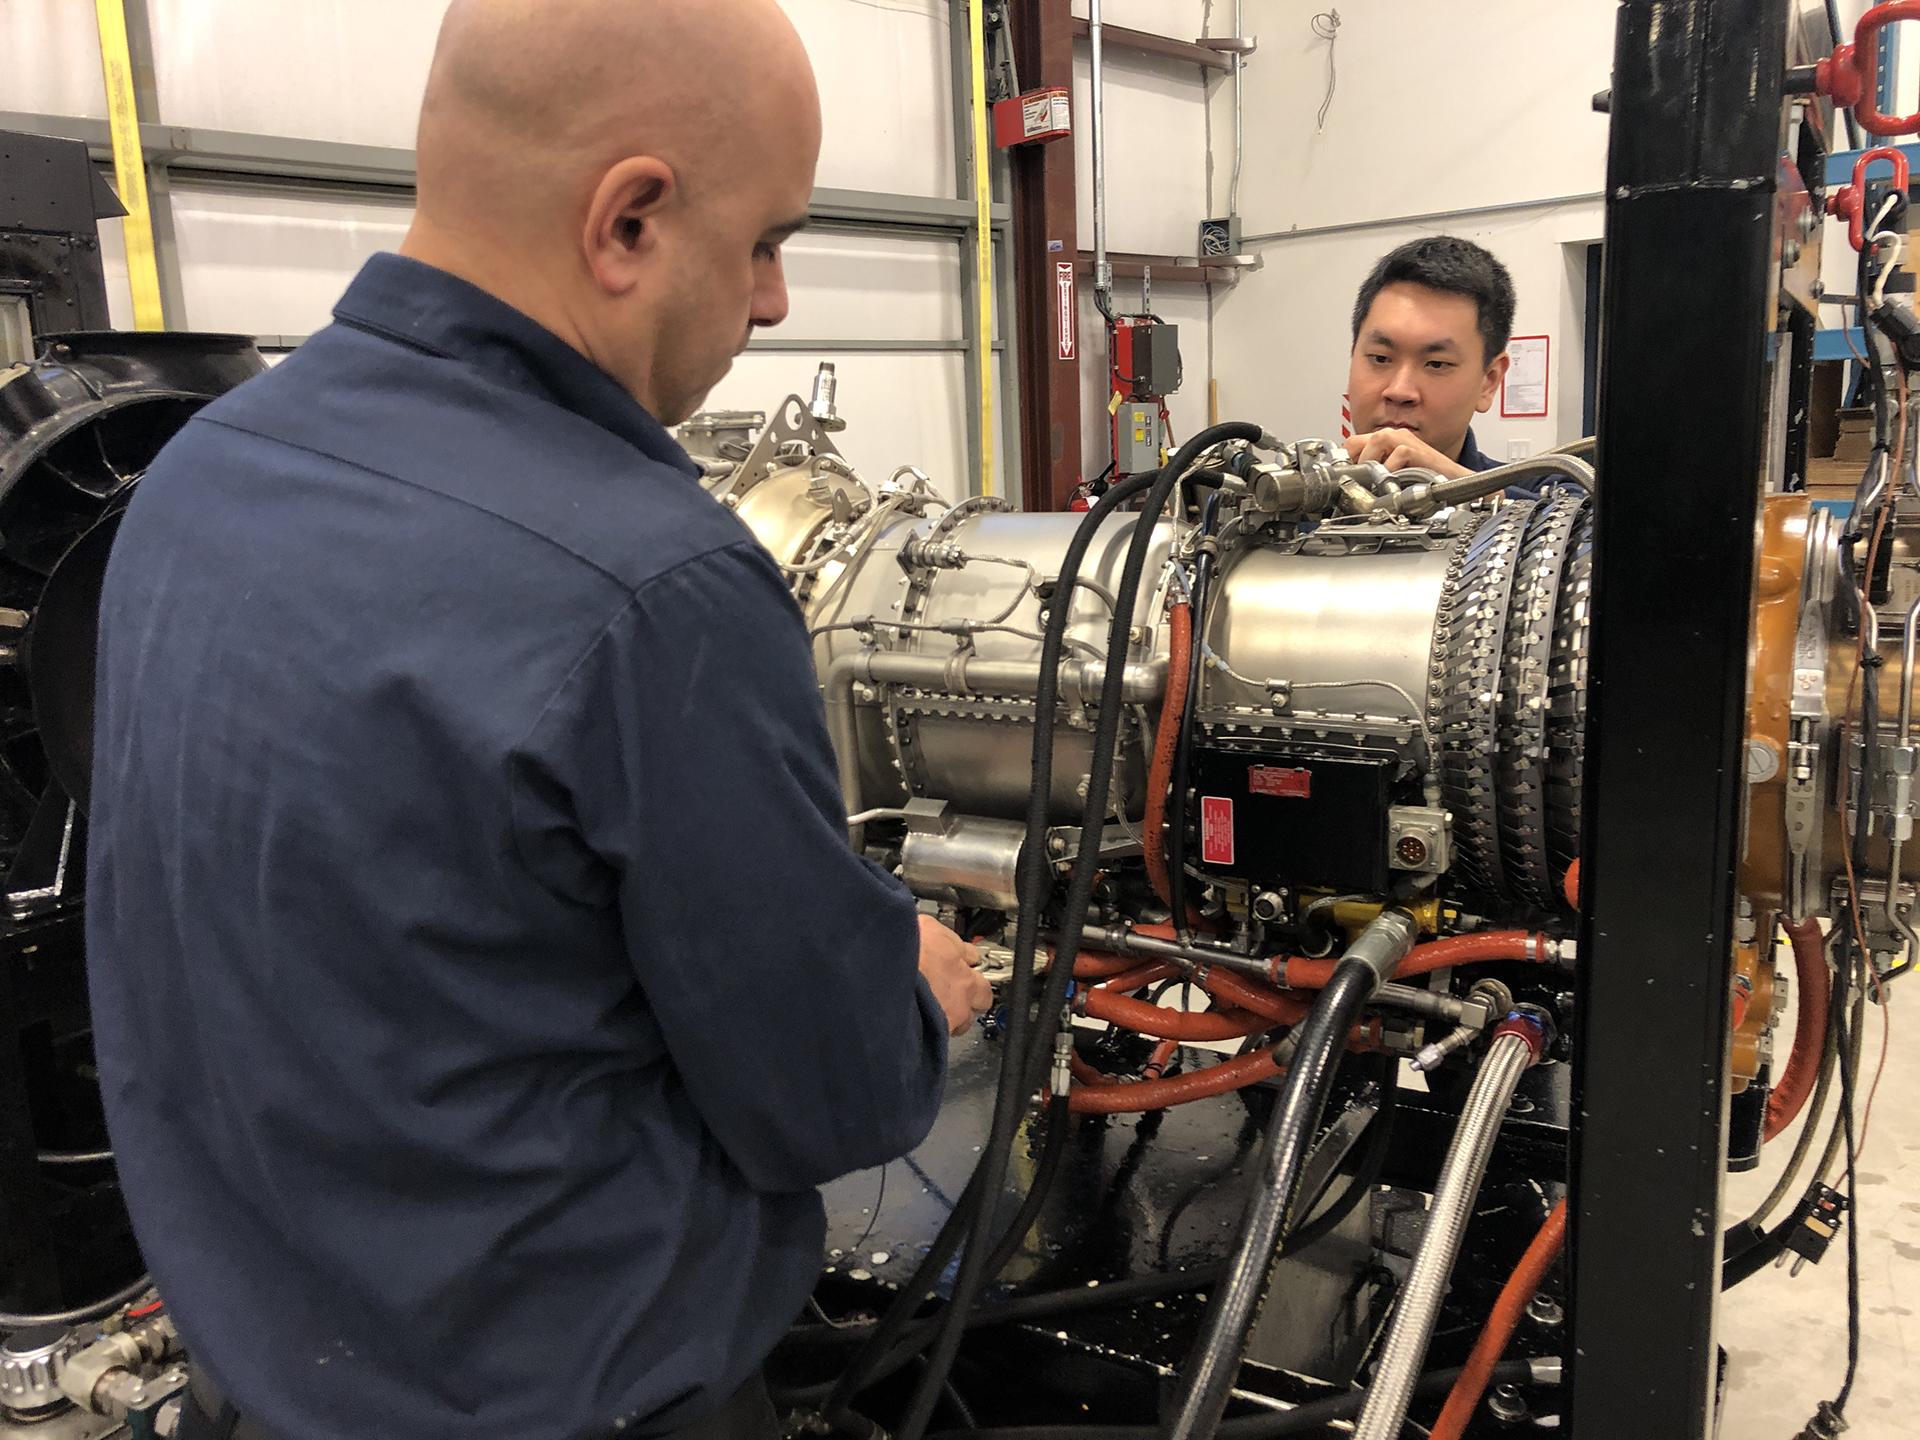 Staff facilitate engine maintenance at Advance Aerospace's maintenance facility